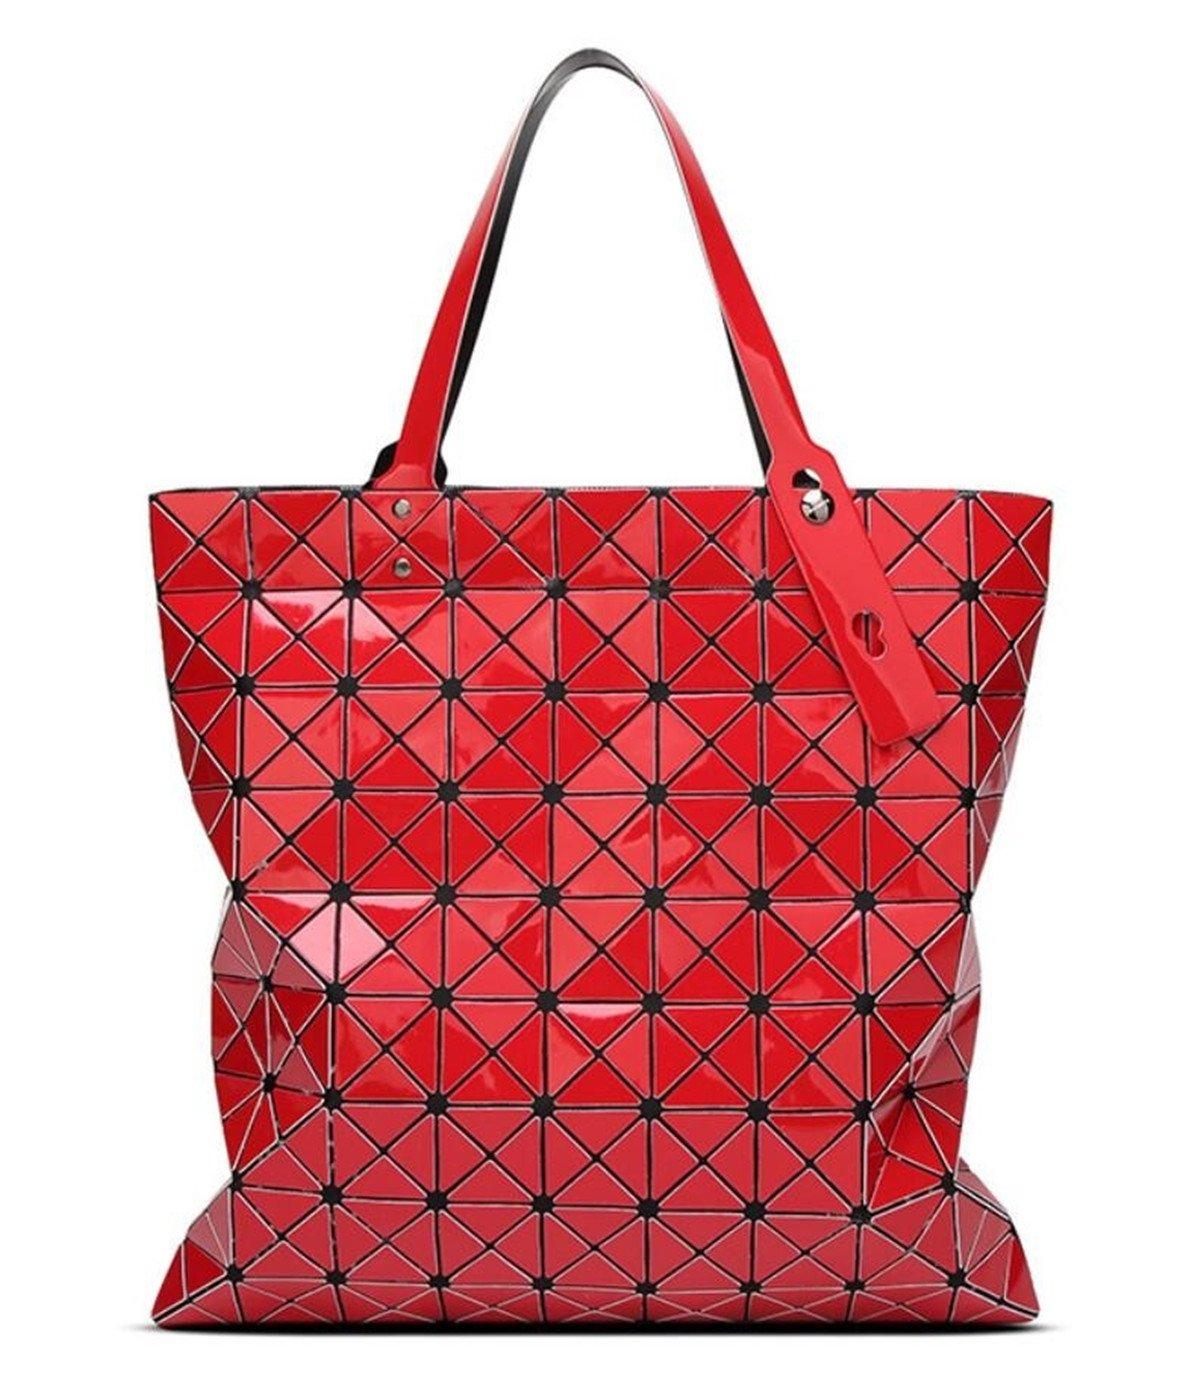 CDM product Kayers Sulliva Womens Fashion Geometric Plaid Tote Bag PU Leather Shoulder Bag Top-handle Handbags Large big image